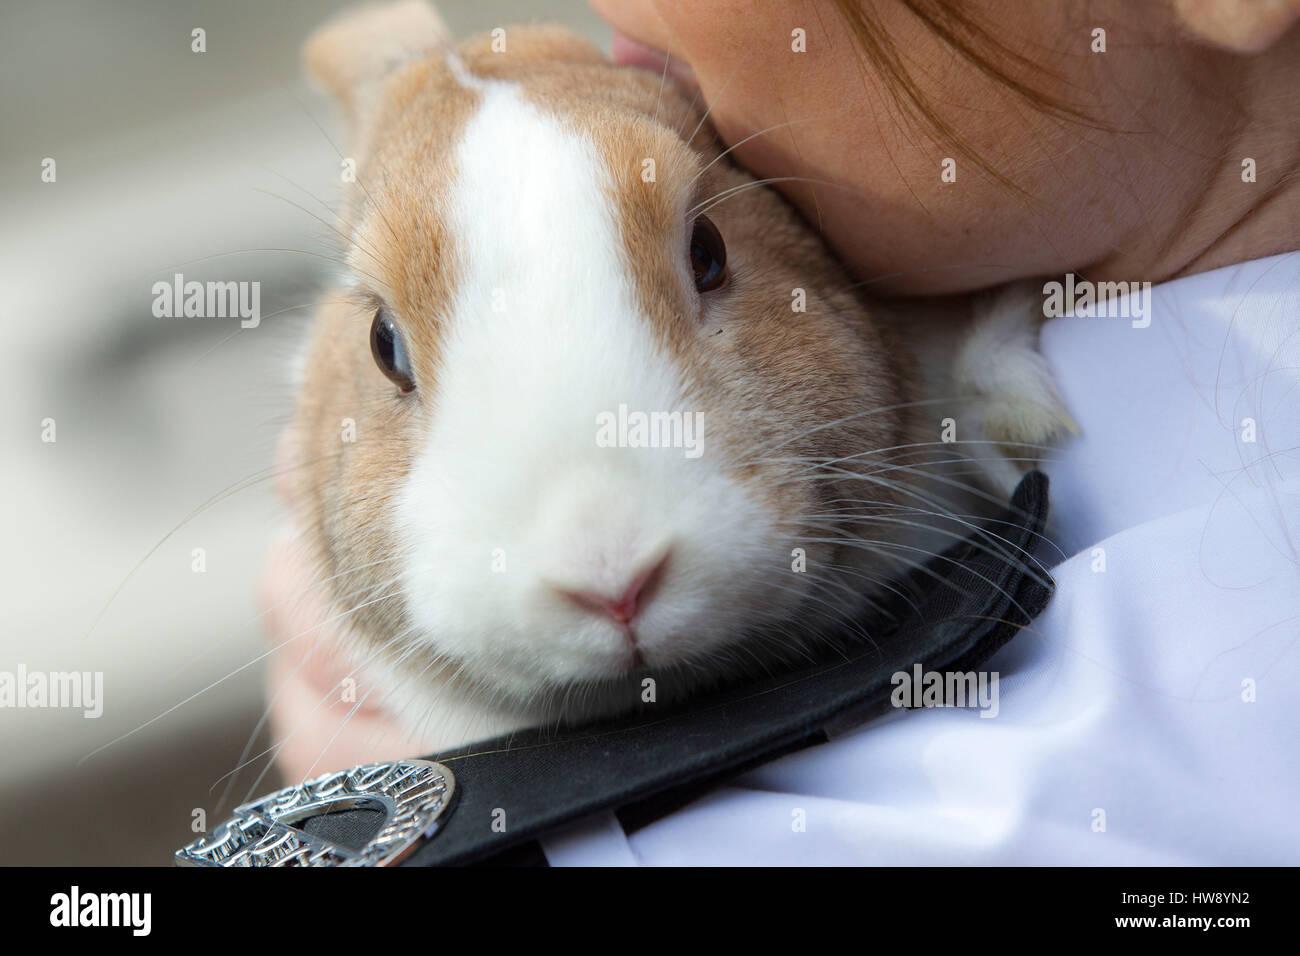 Animal rescue worker holding rabbit - Stock Image